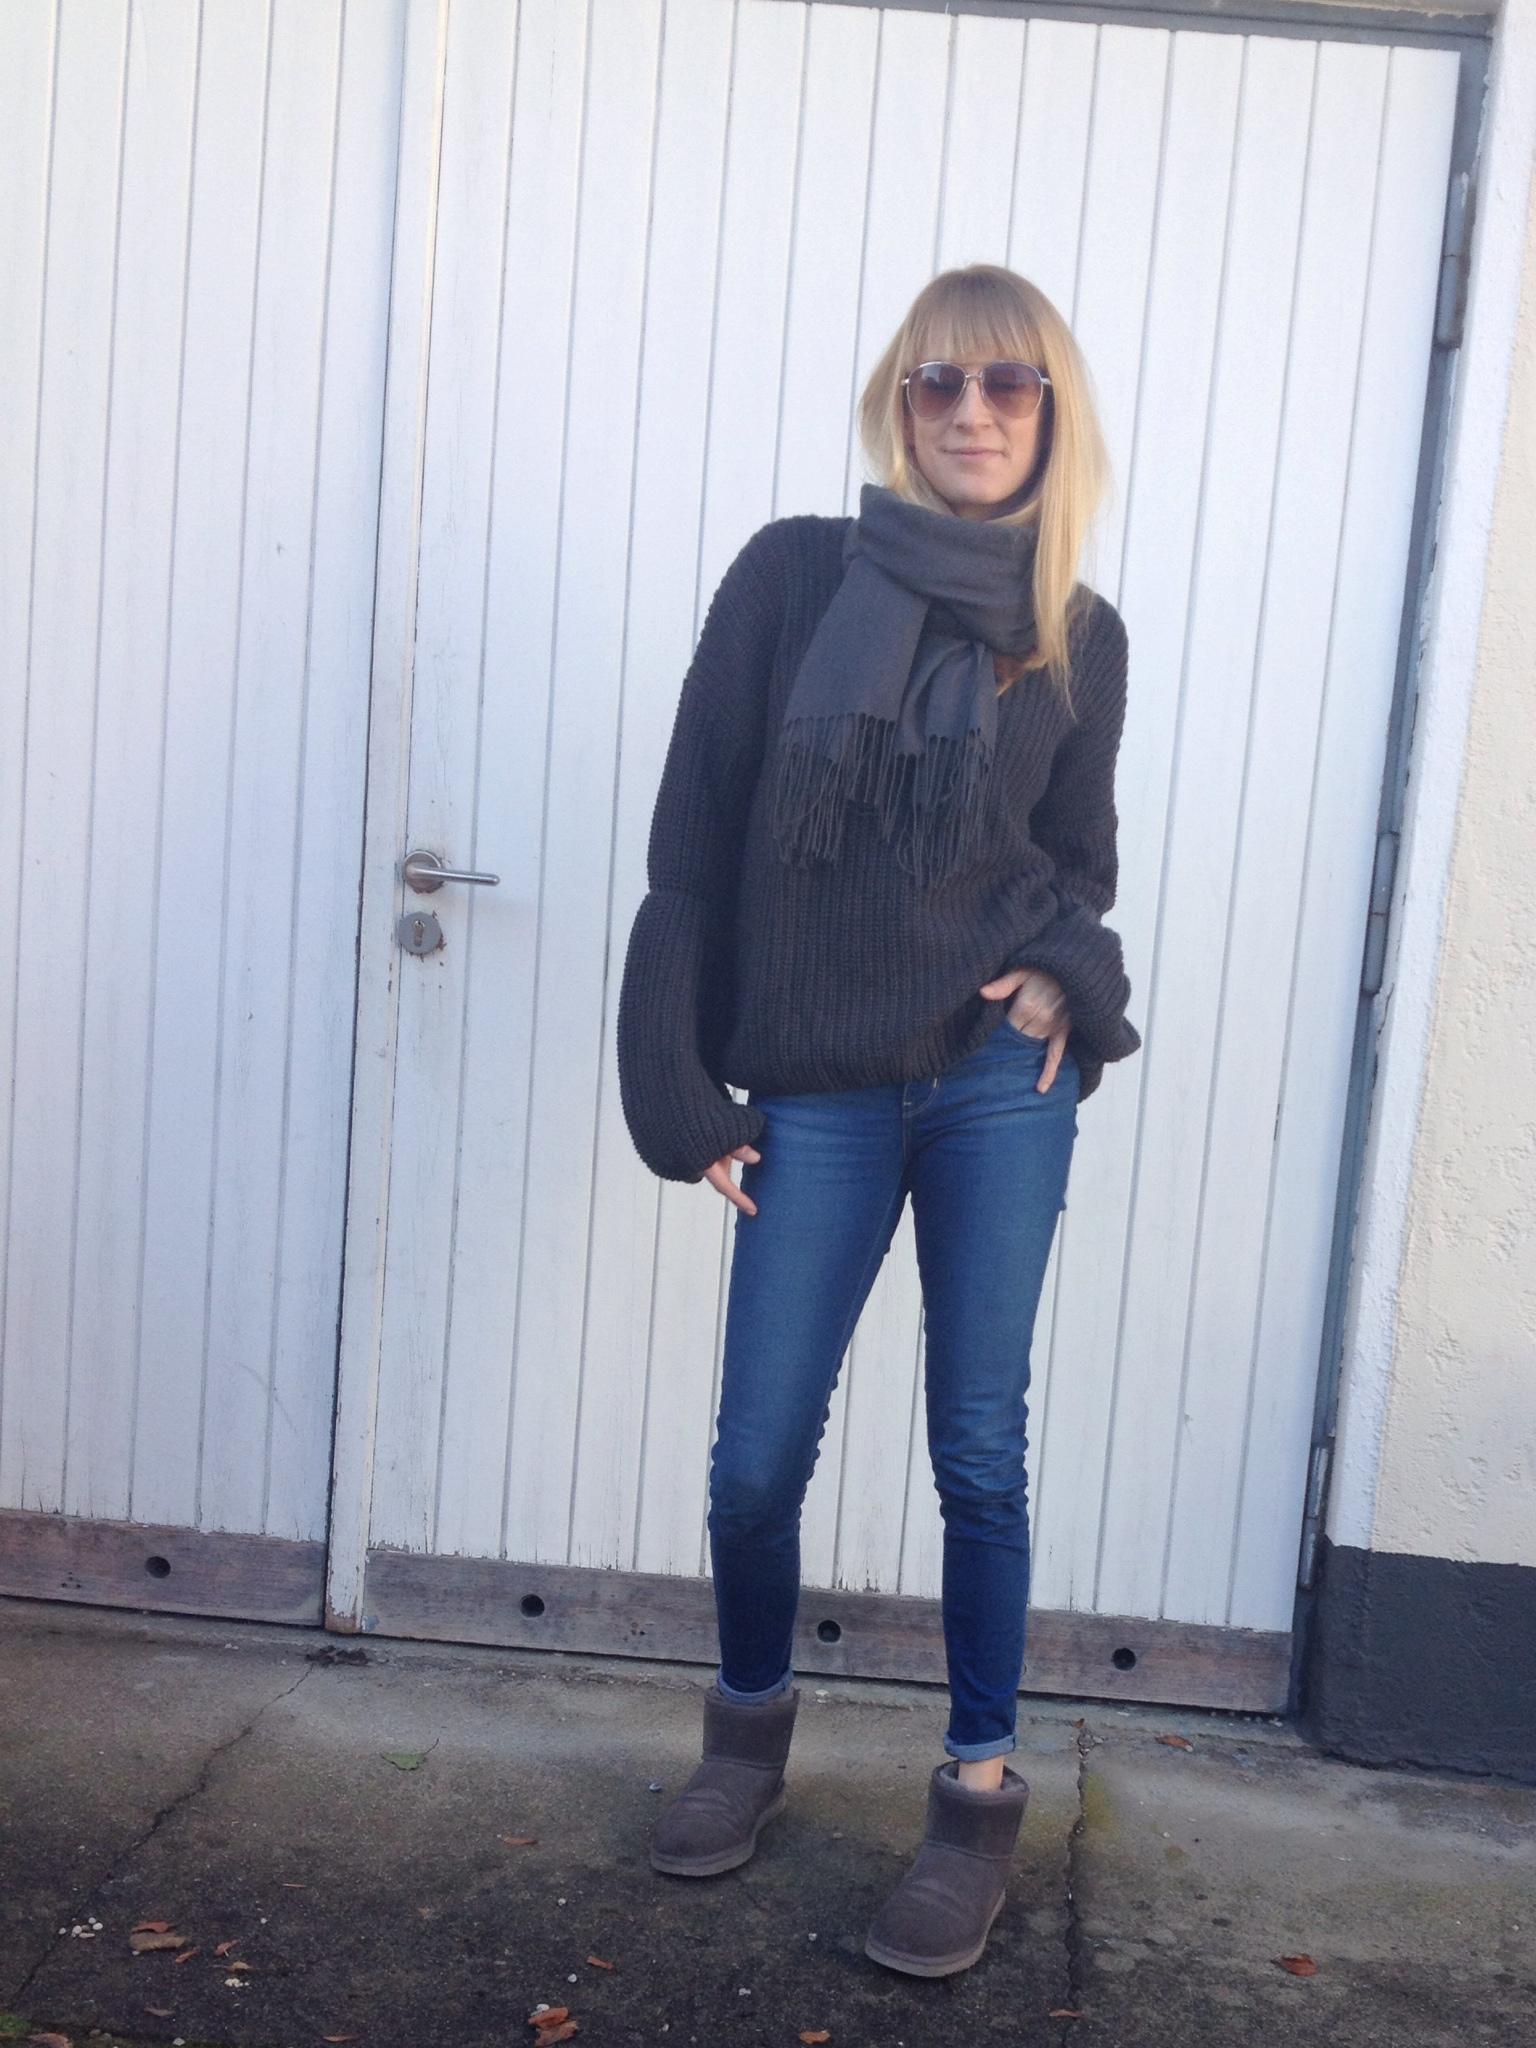 Ärmel in Überlänge, Pullover, Pullover Vila, Zalando Sale, Mamablog, Modeblog, Modemama, Mamastyle, Winterpullover, Strickpullover, Trend im Test